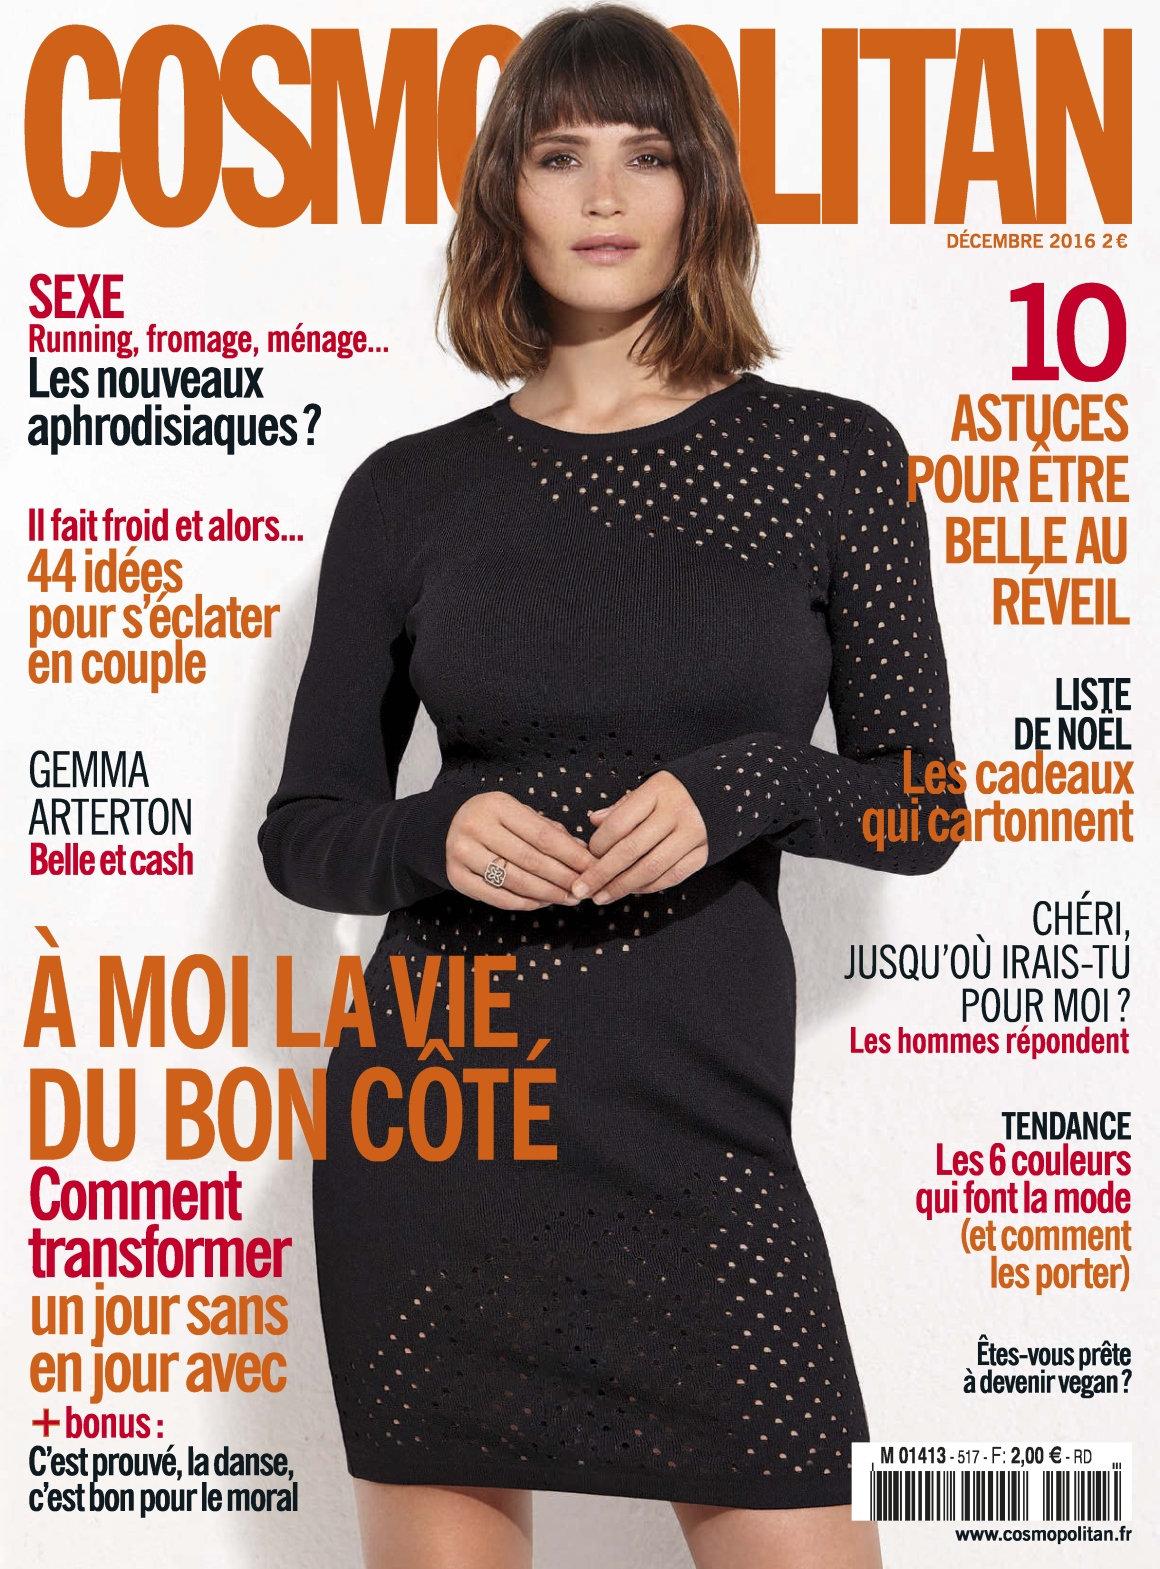 Cosmopolitan 517 - Décembre 2016